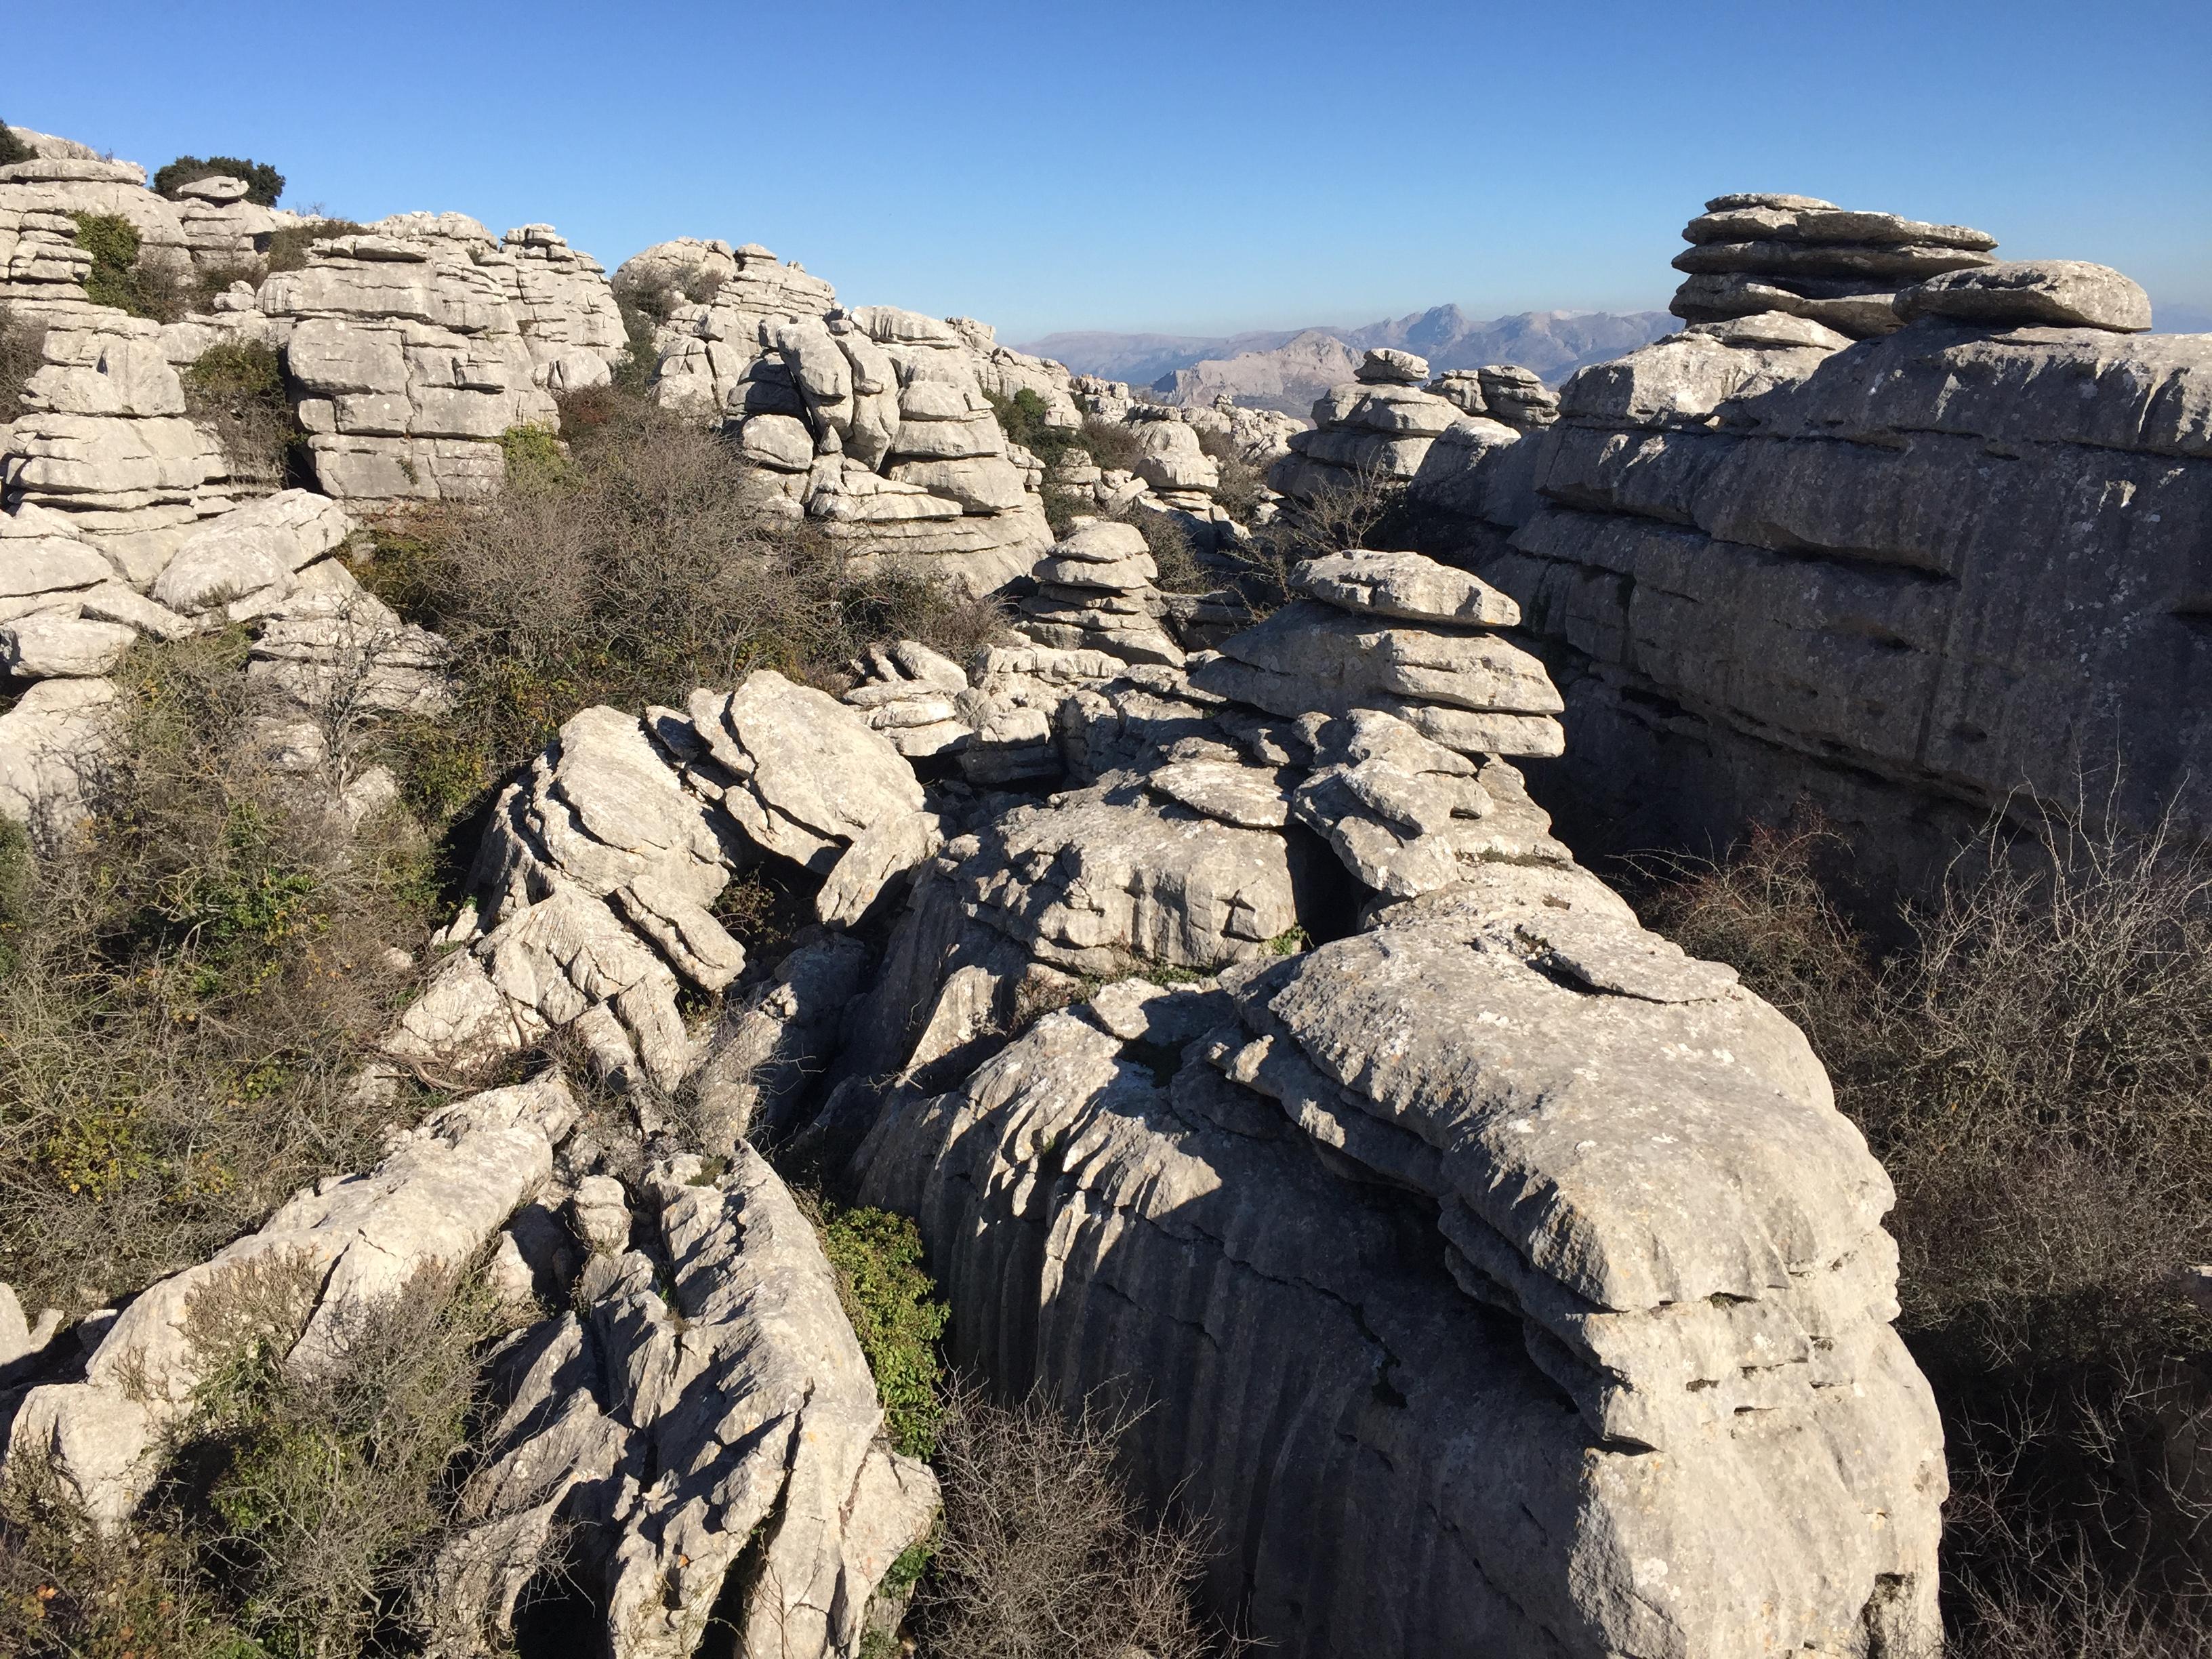 Парк камней Эль Торкаль